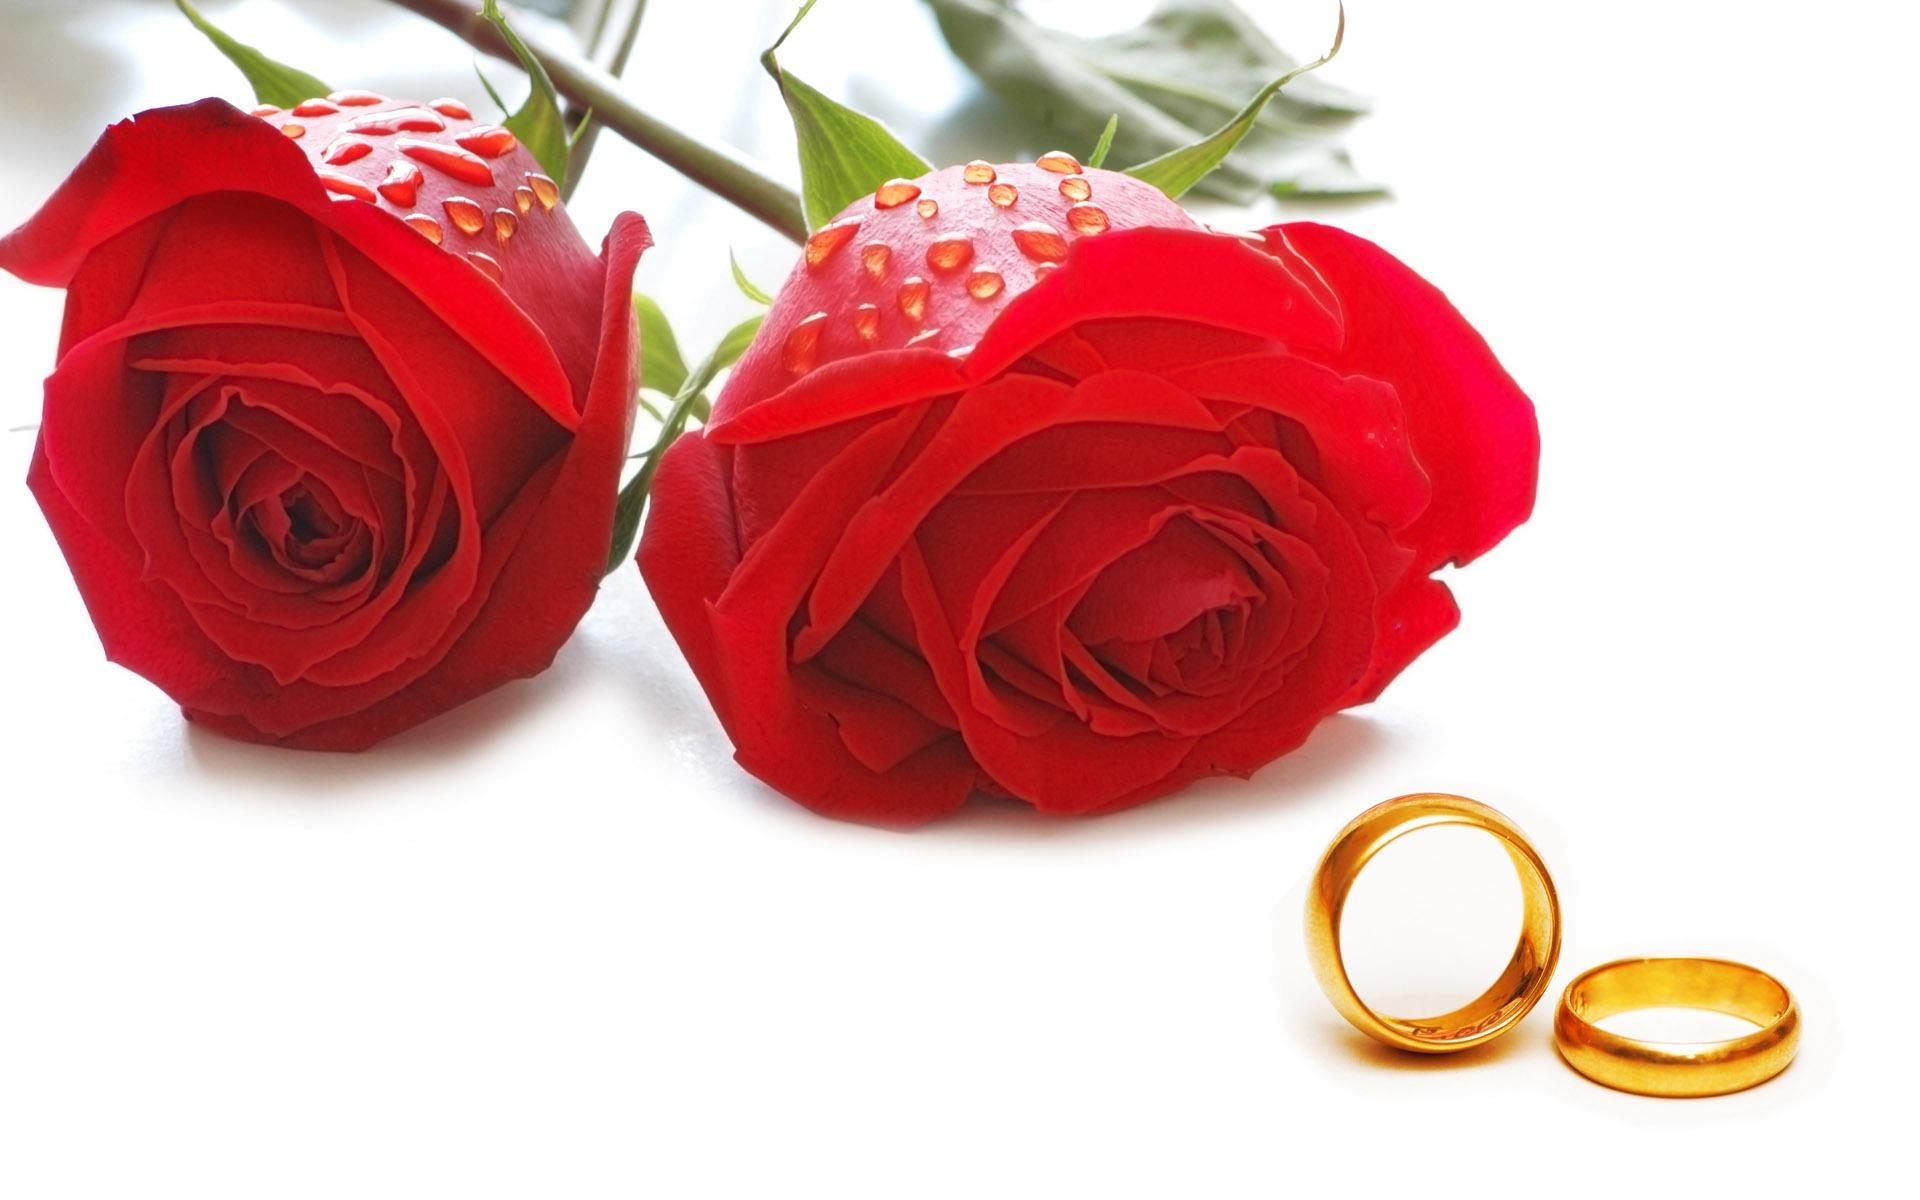 Weddings And Wedding Ring Wallpaper 1 12 1920x1200